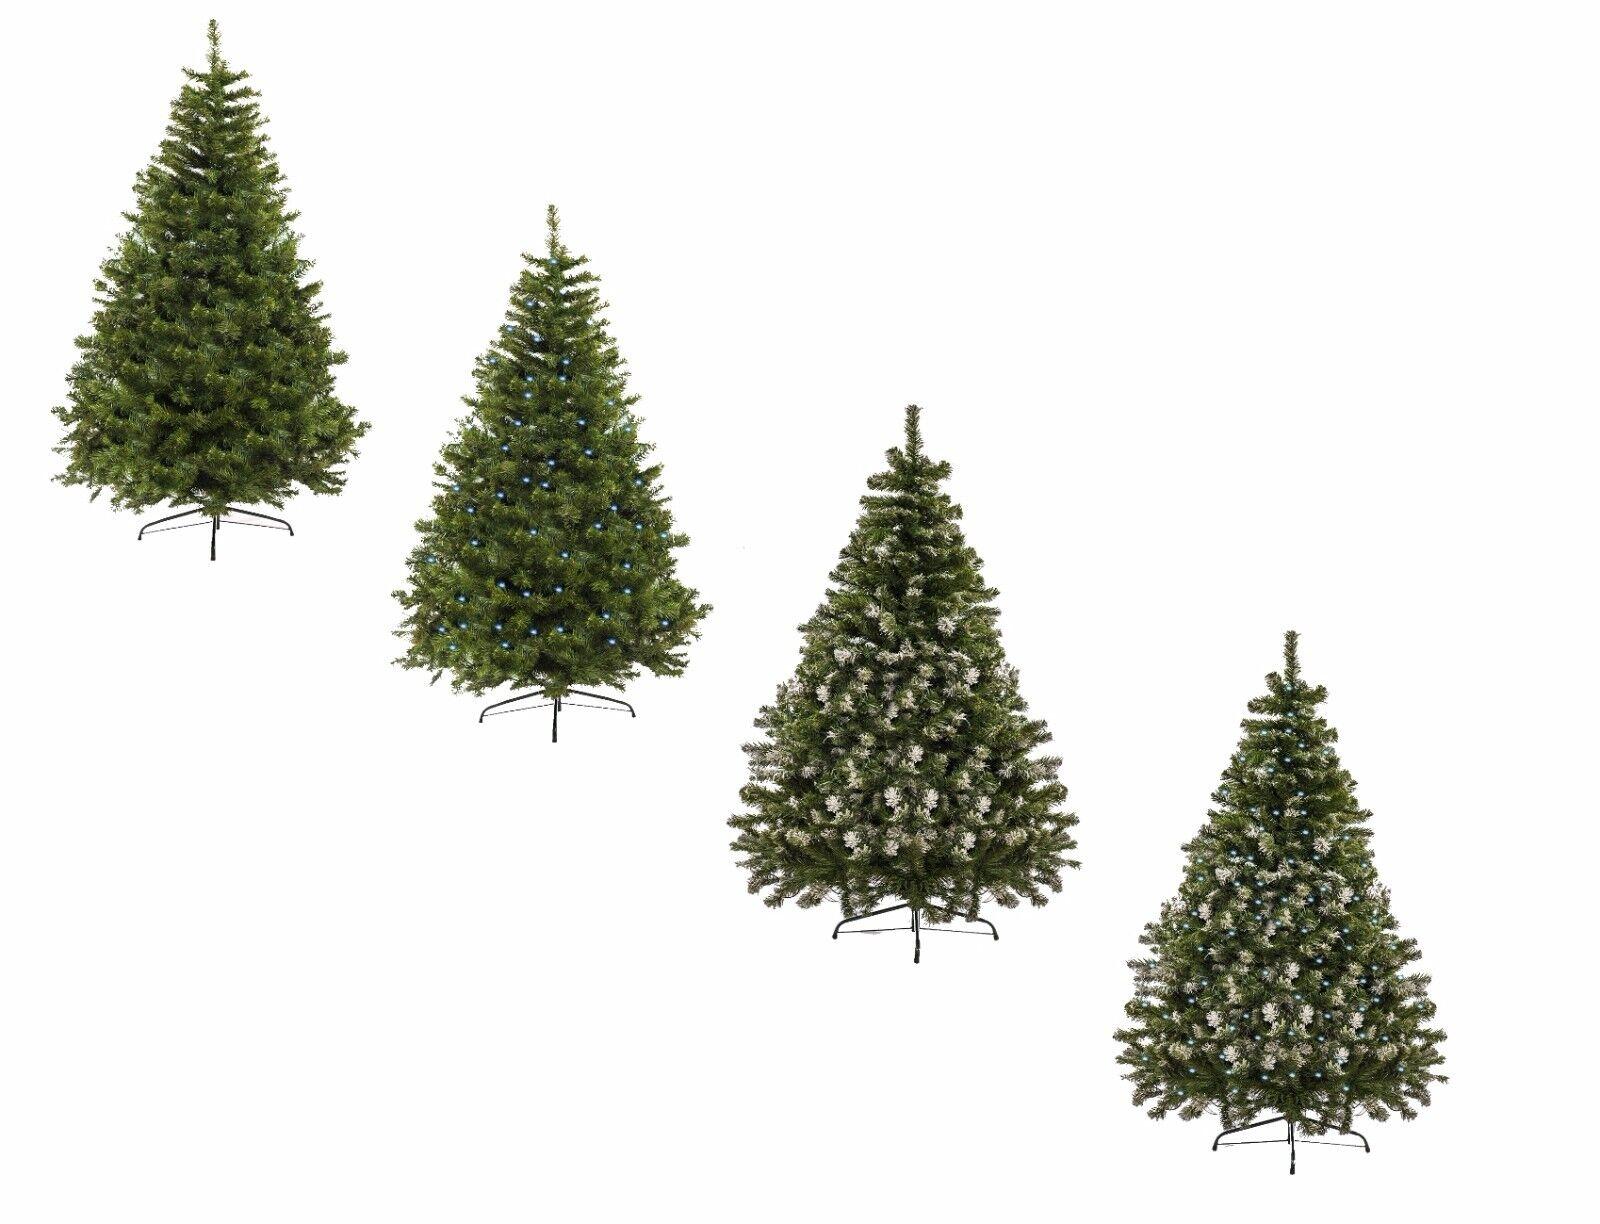 Tannenbaum künstlicher Weihnachtsbaum 120 - 210cm LED LED LED Christbaum Kunstbaum PVC | Stabile Qualität  1e6b0d